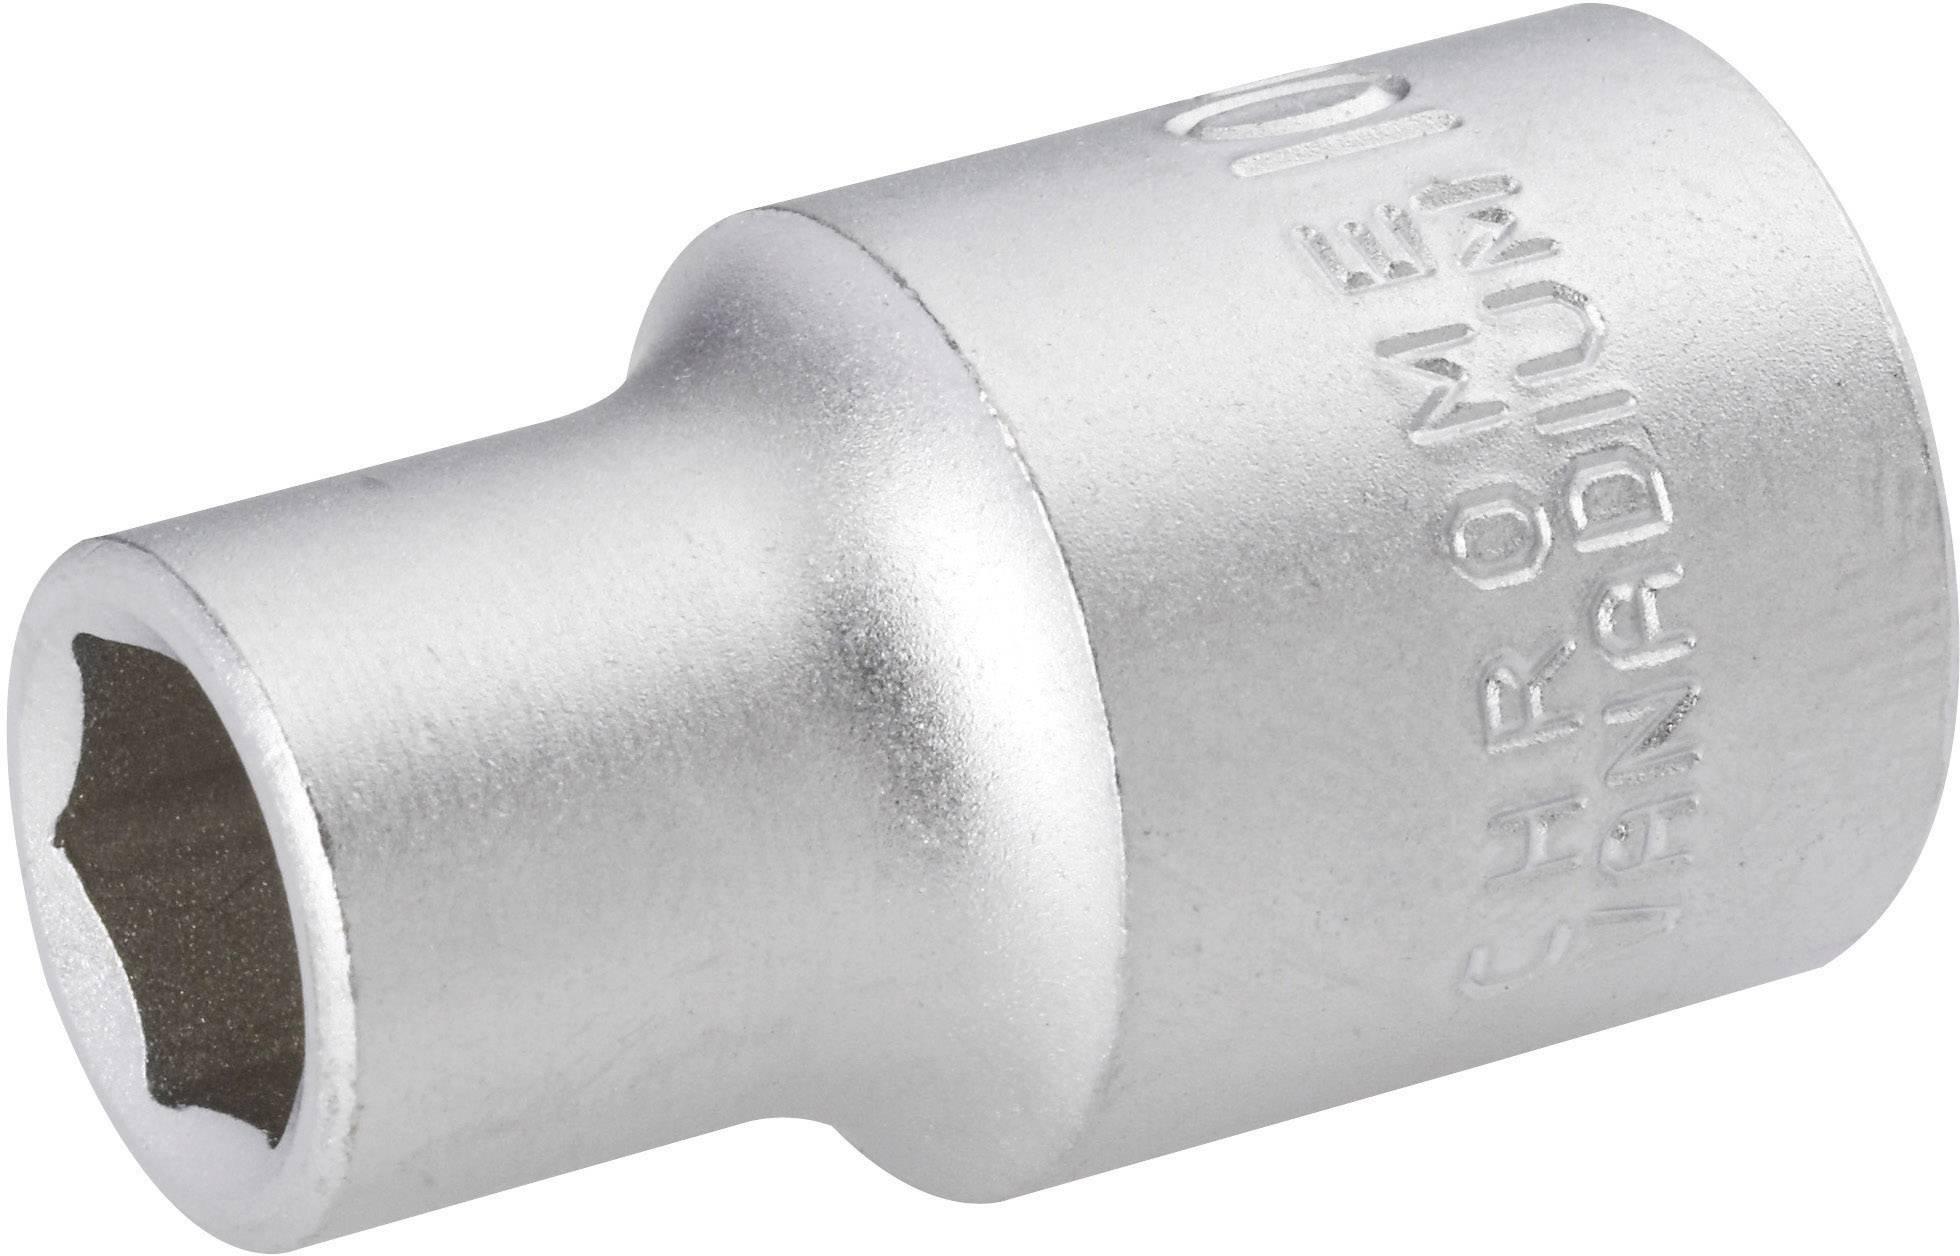 "Nadstavec na račňu TOOLCRAFT 820774, 1/2"" (12.5 mm), 20 mm"